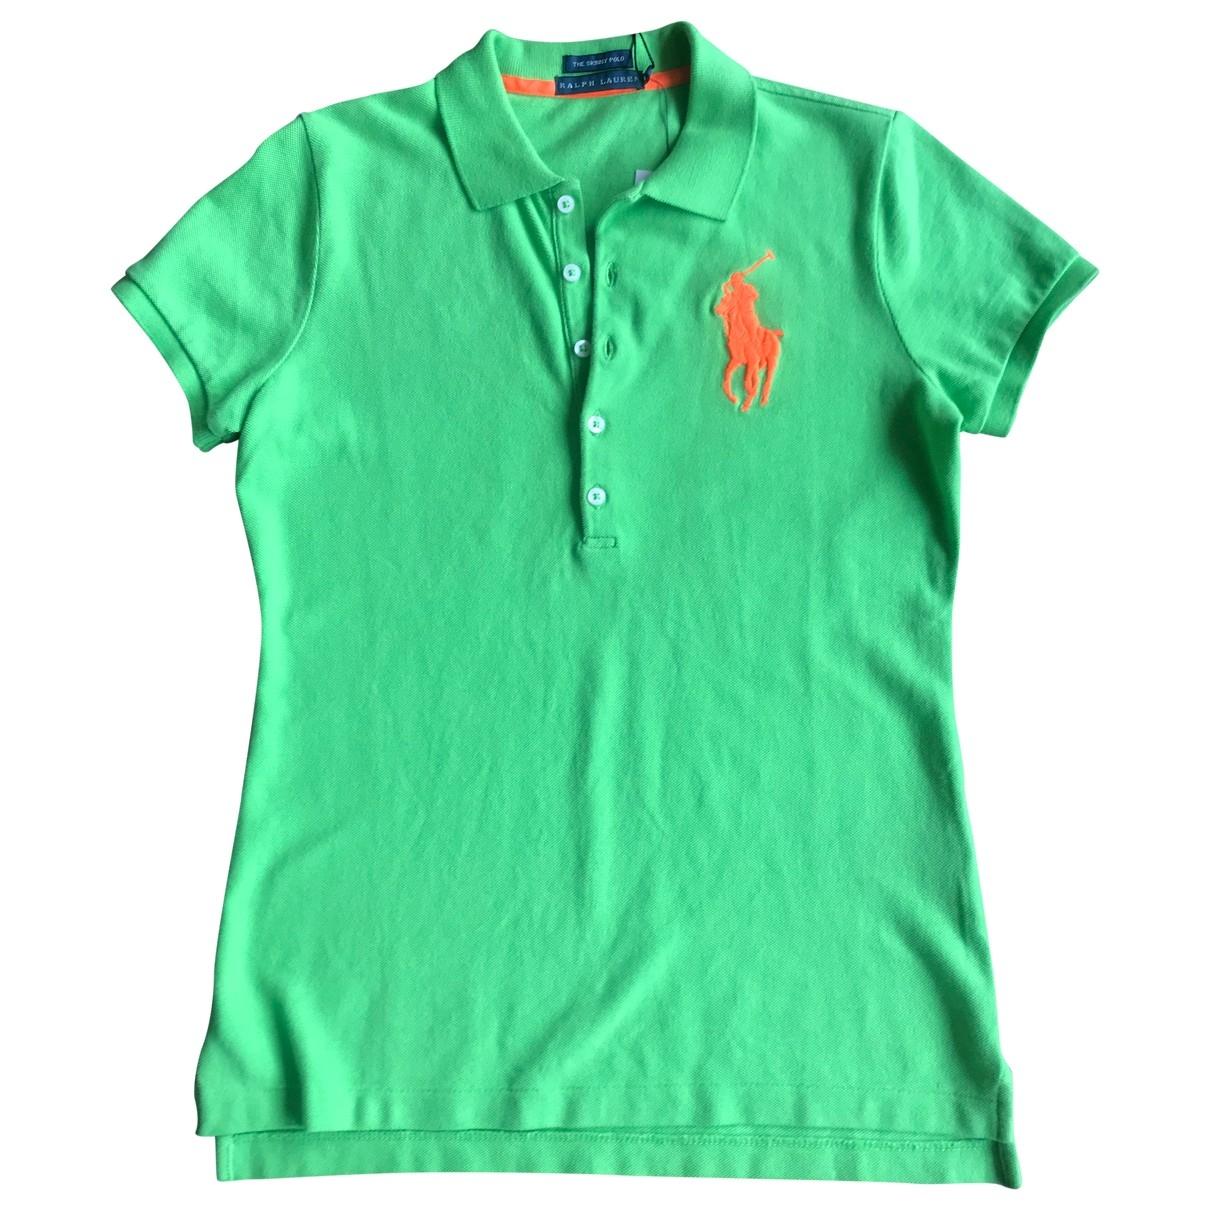 Polo Ralph Lauren \N Top in  Gruen Baumwolle